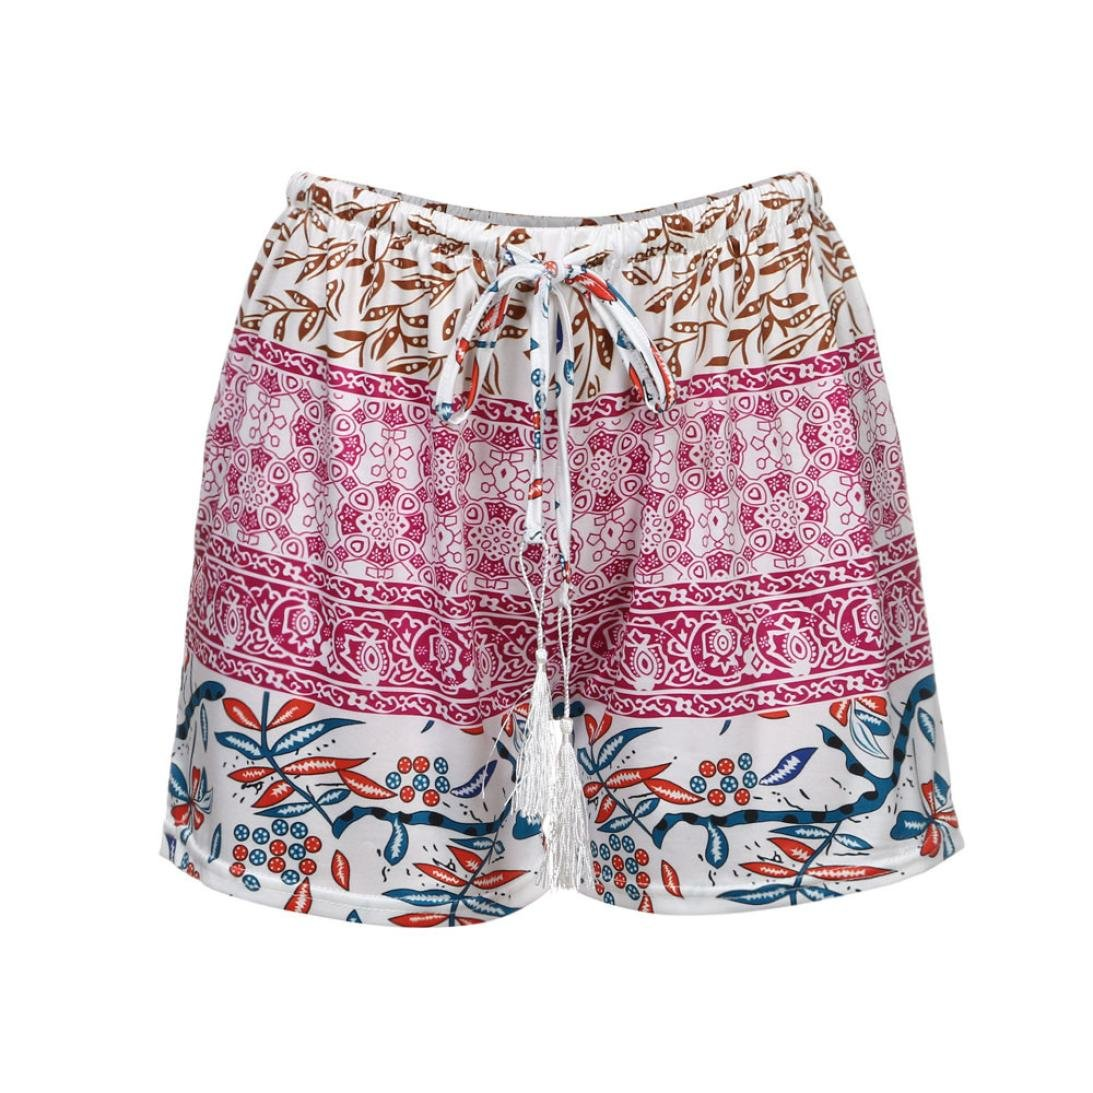 05d543a03b1 Amazon.com  Clearance!Women Shorts